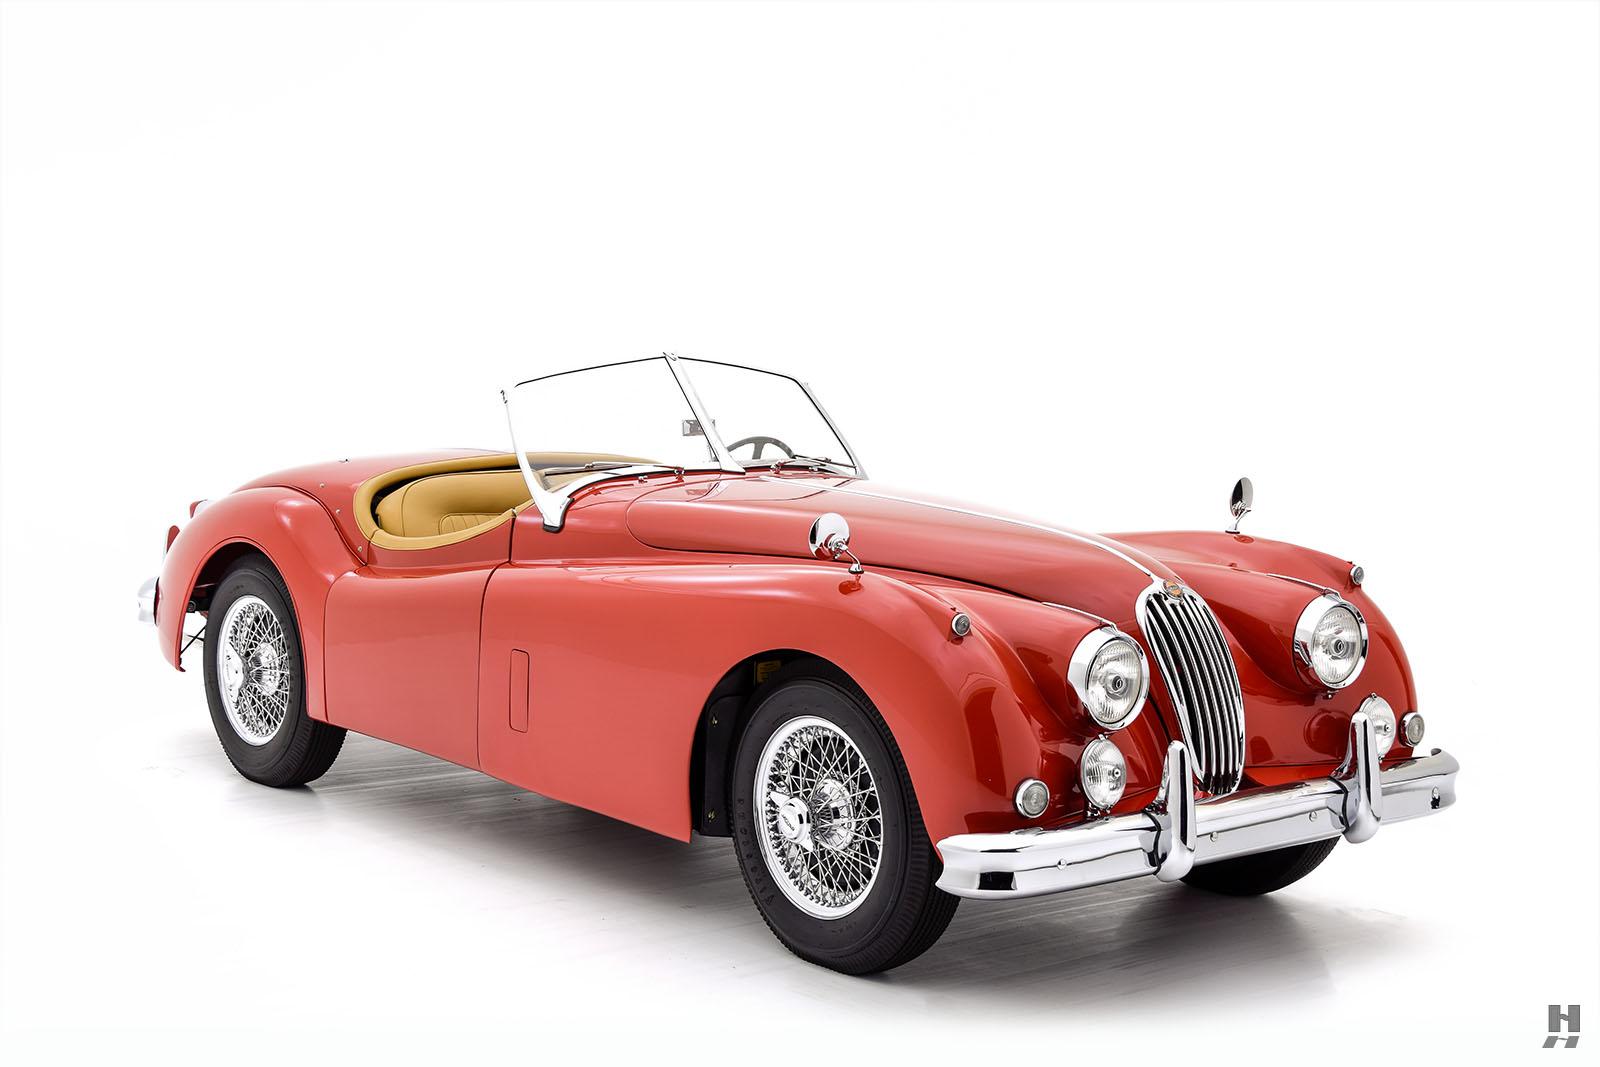 1957 Jaguar XK140 MC Roadster For Sale | Buy Classic Cars ...